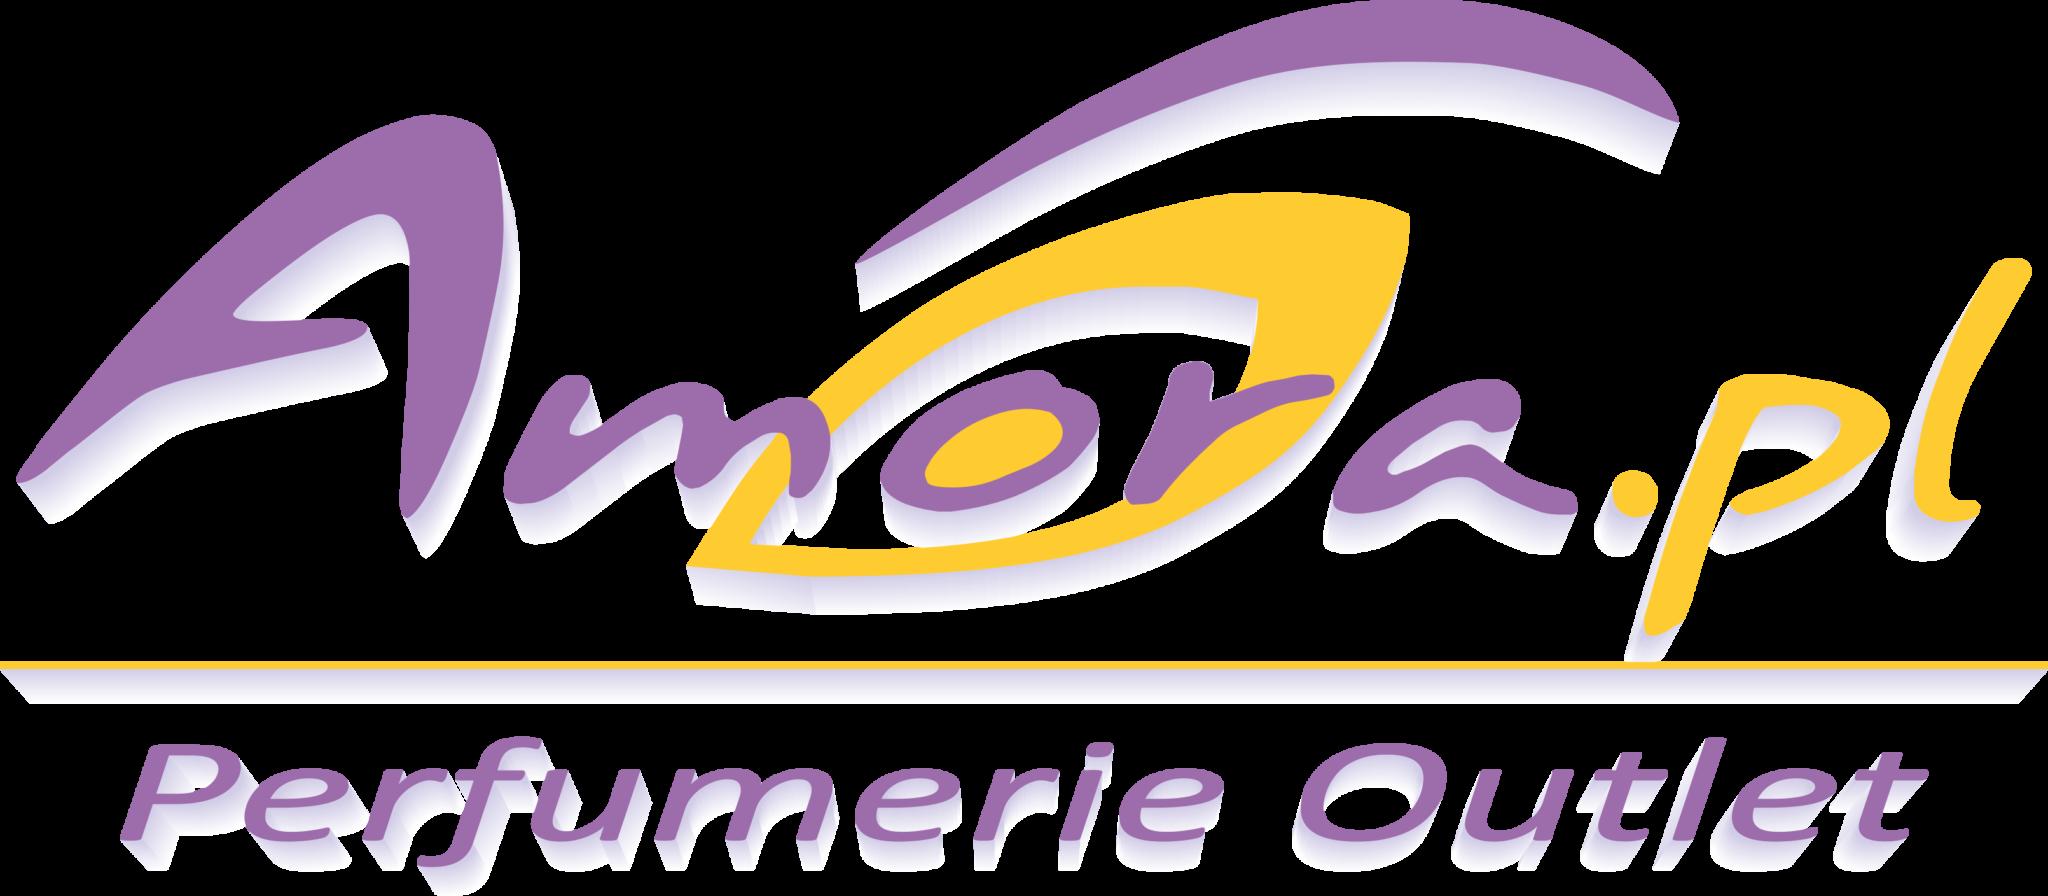 Perfumerie Outlet Amora.pl poszukuje nowego pracownika